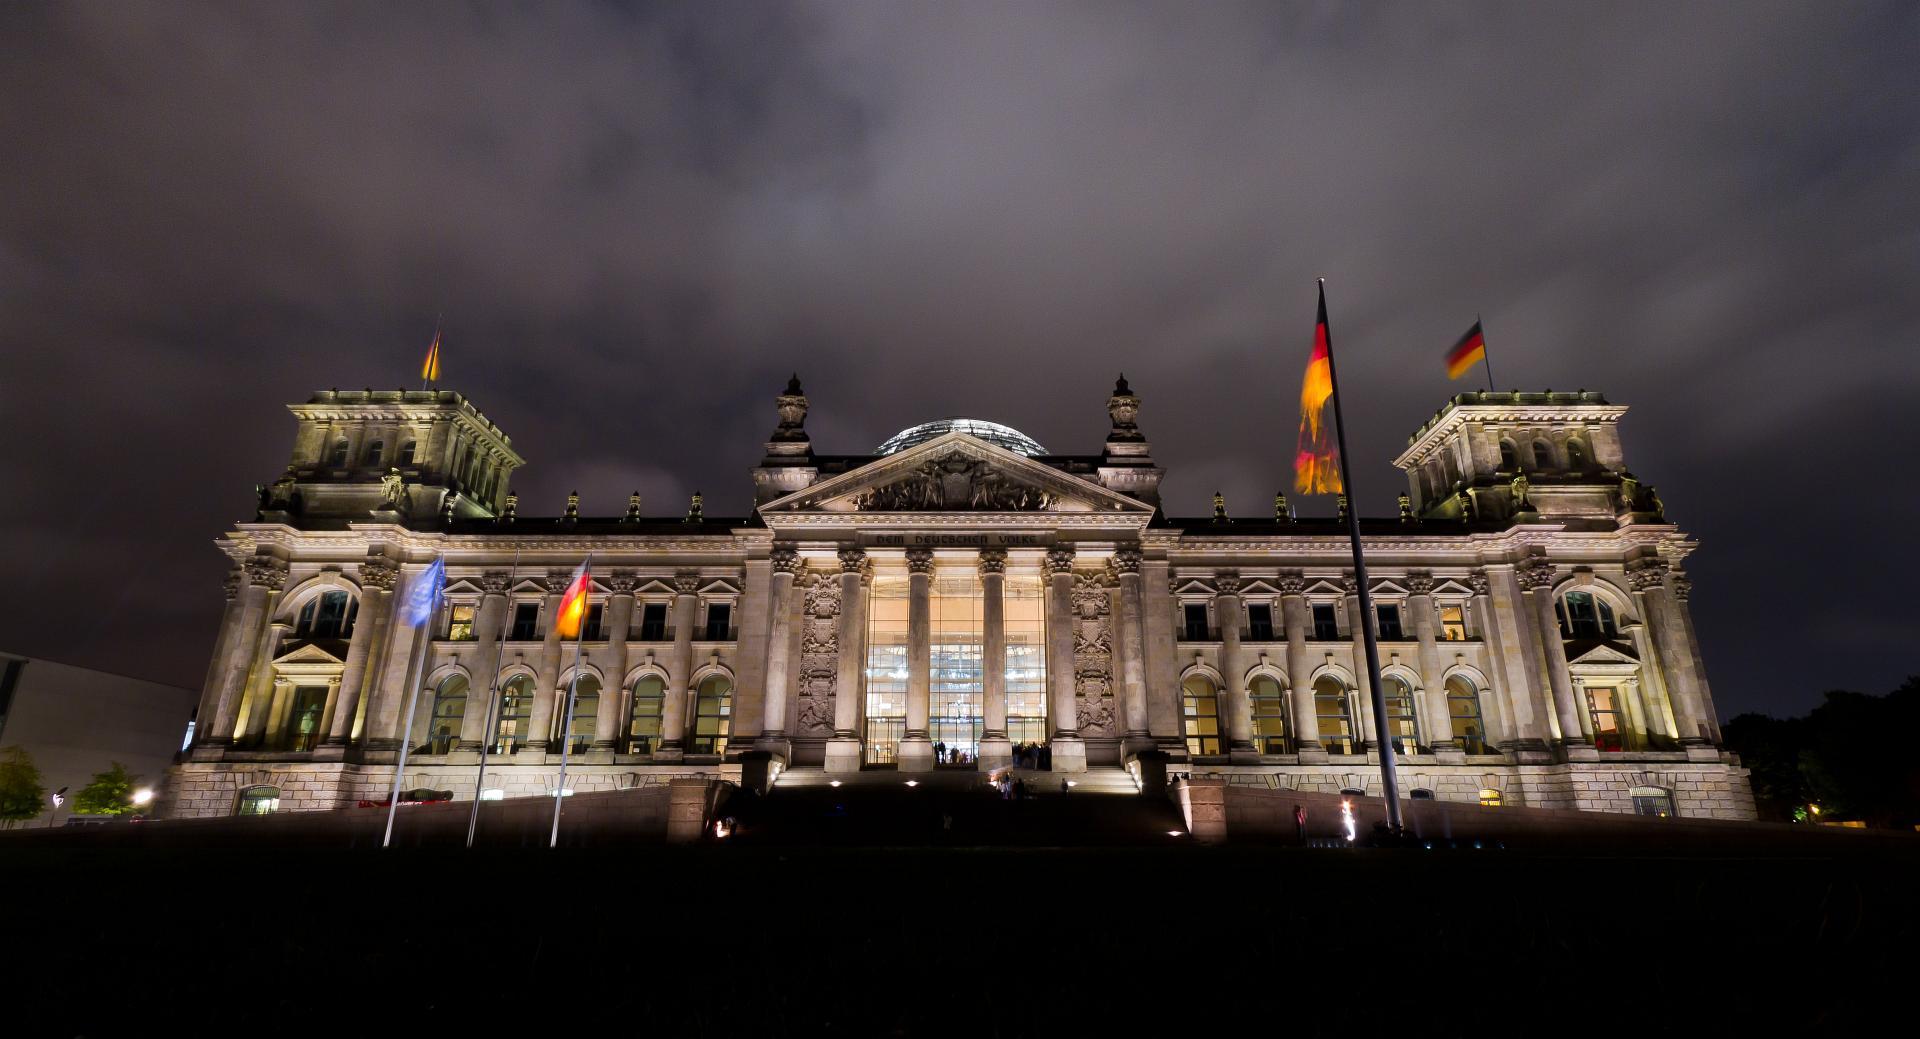 Reichstag, Berlin, Njemacka (Reichstag, Berlin, Germany)